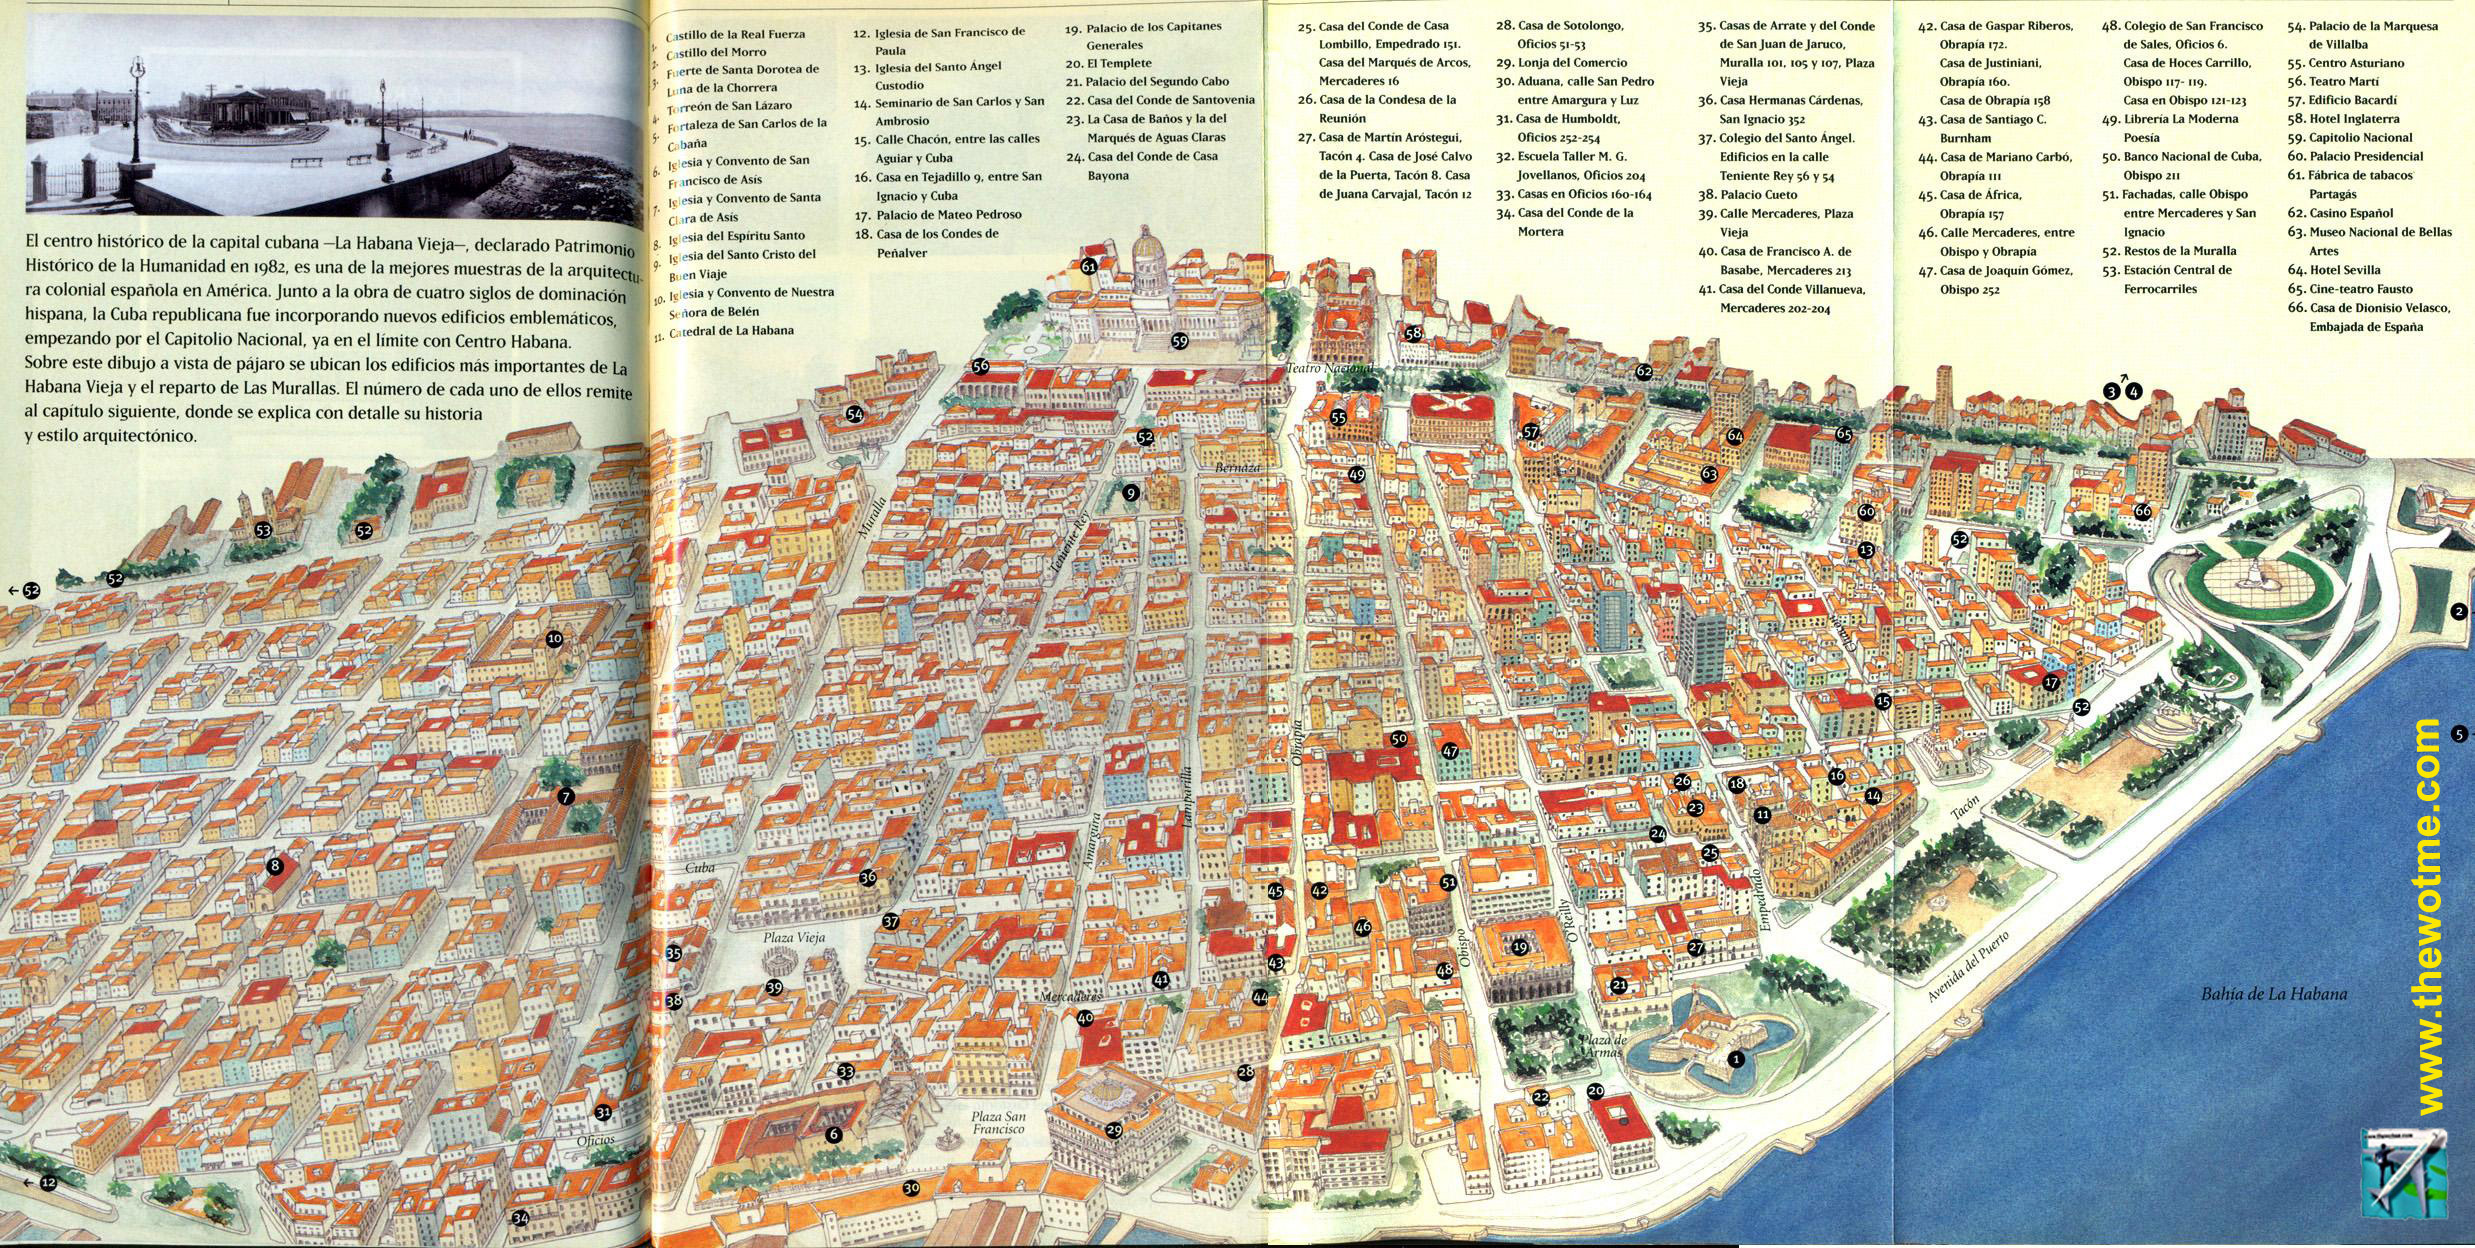 Mapa de La Habana, Cuba [object object] - 7886049588 d6aa7257a3 o - La Habana vieja y un paseo por sus plazas